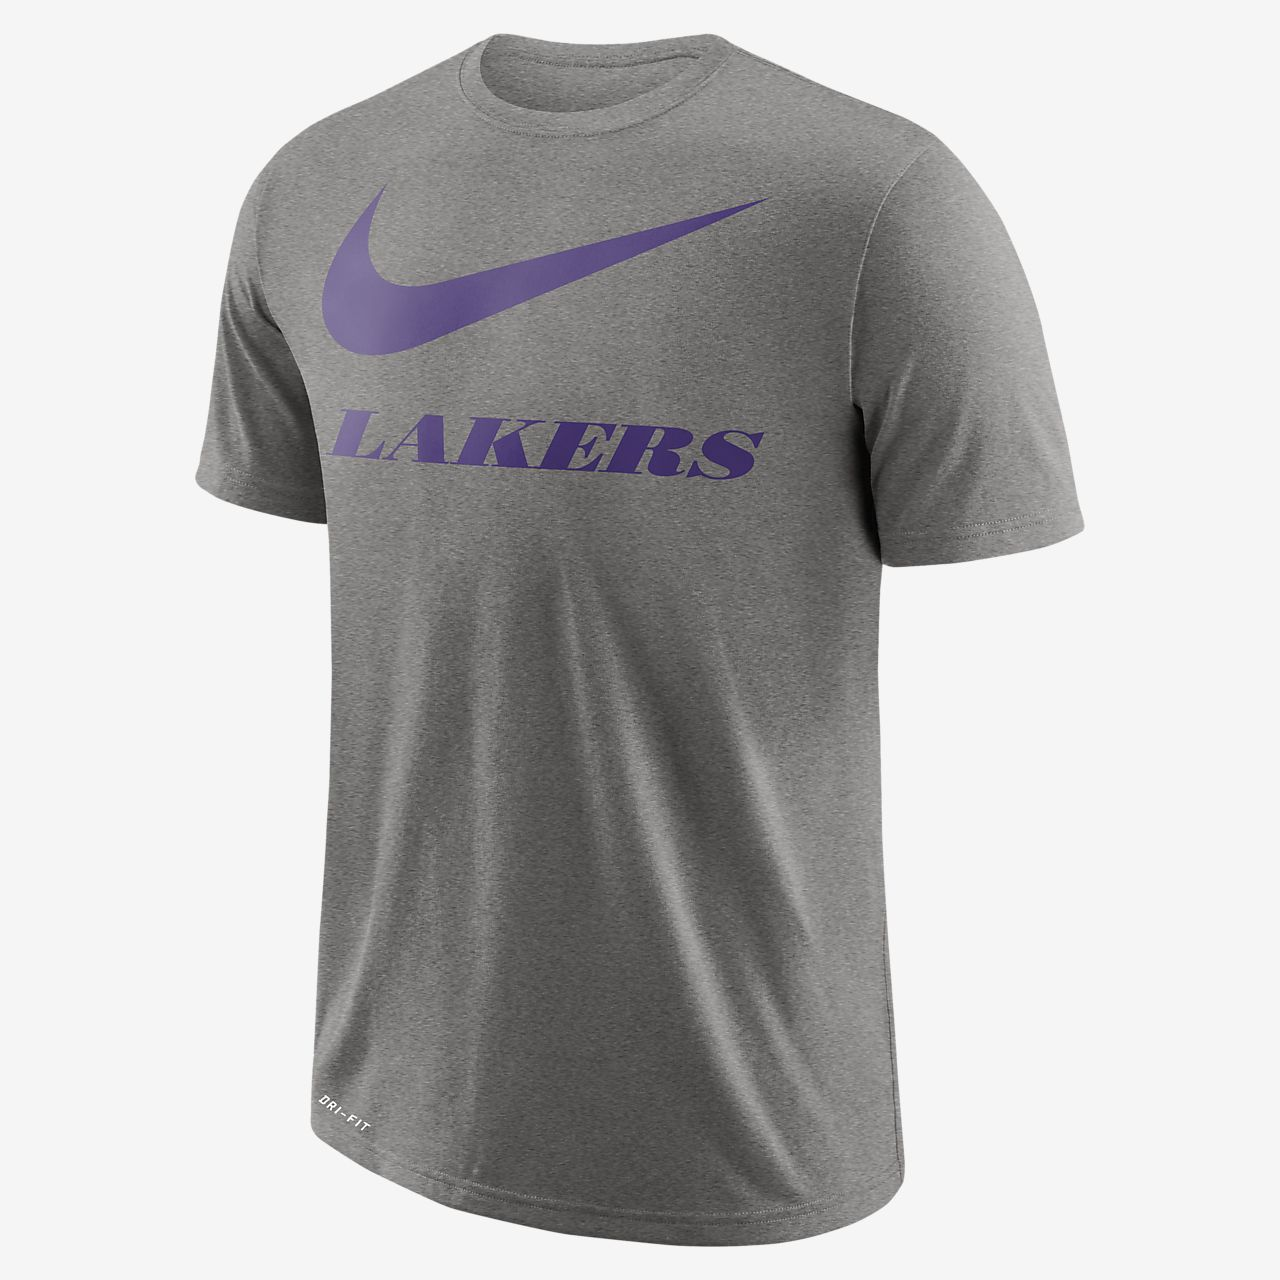 855a9b353 Los Angeles Lakers Nike Dry Men s NBA T-Shirt. Nike.com IN